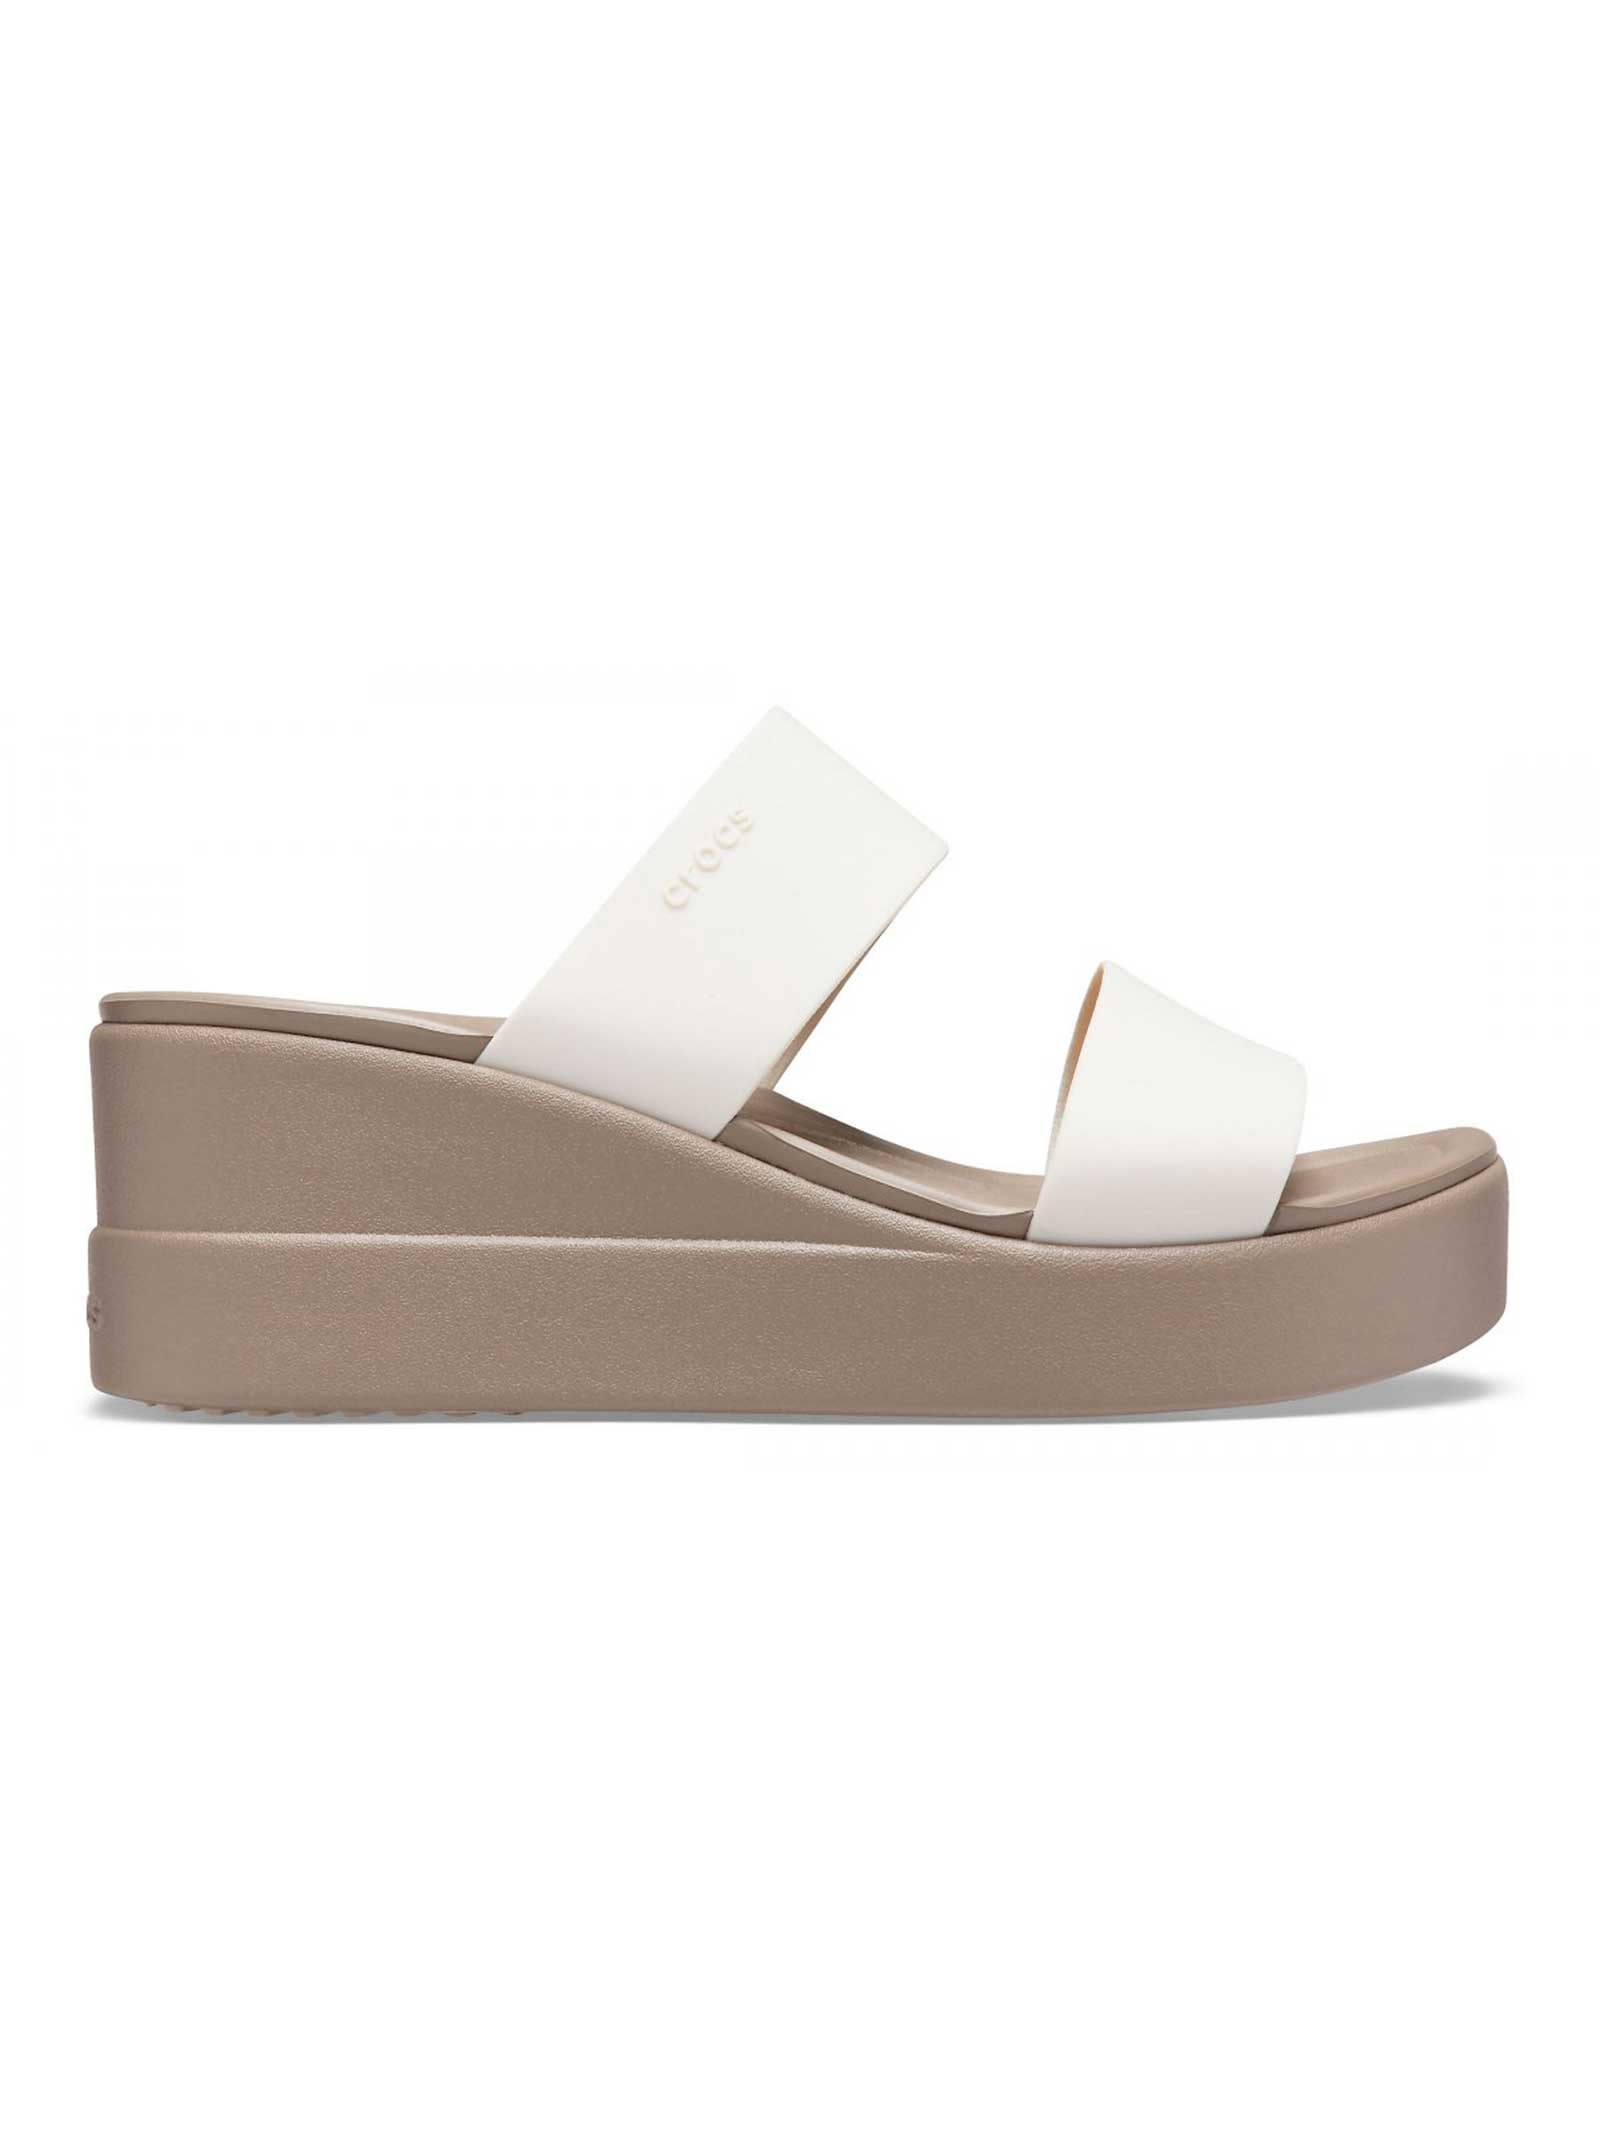 SANDALO DONNA CROCS | Sandalo | 20621916T